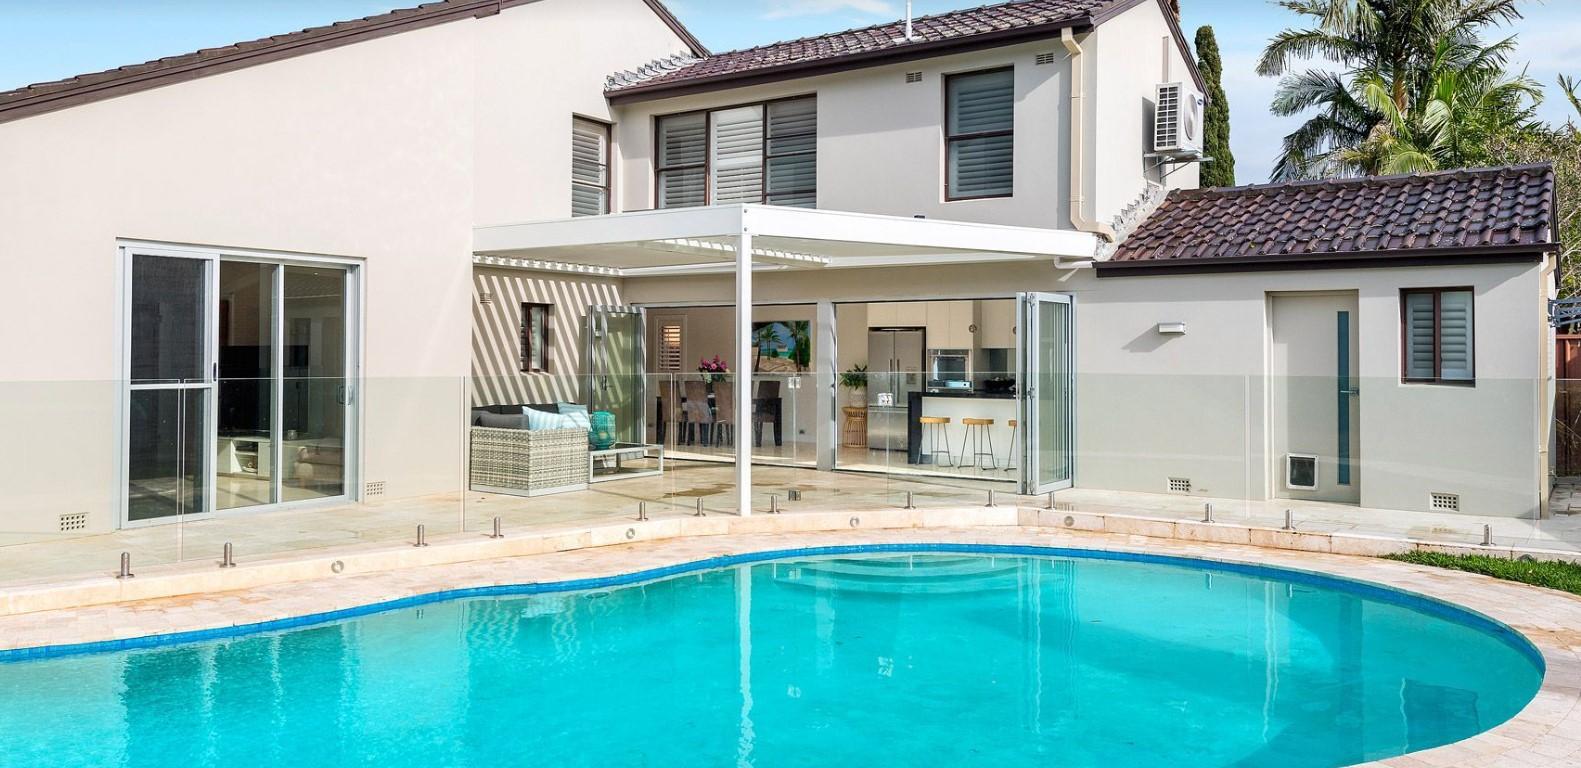 https://djwproperty.com.au/property/house-nsw-sylvania-waters-5edee25d-8221-44e7-a662-b456b5433136/